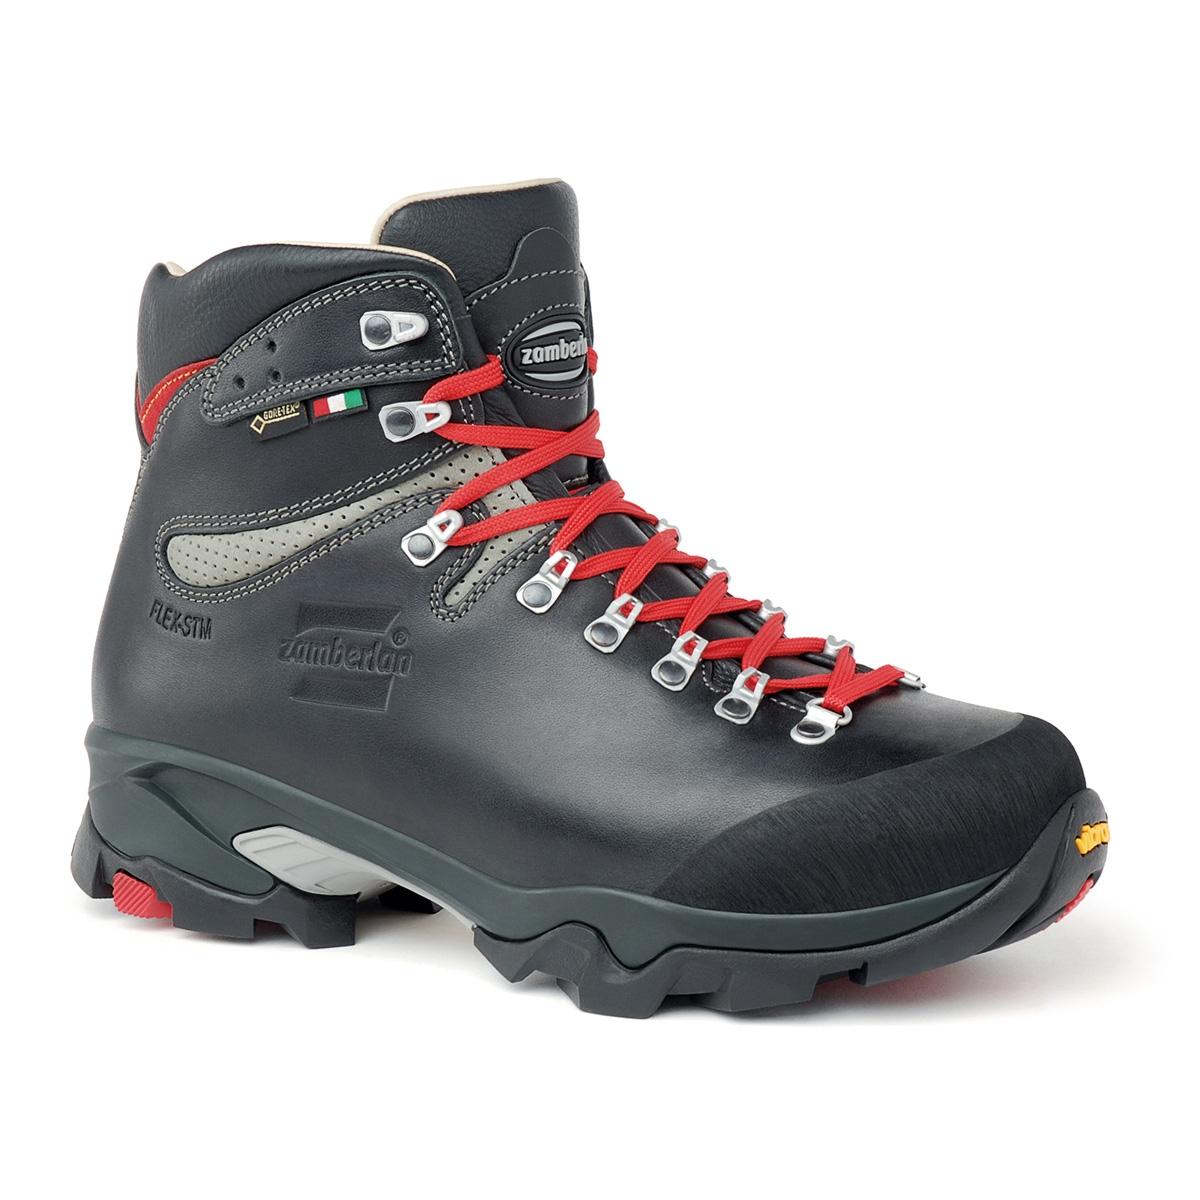 ecaa64f0d54 Zamberlan 1996 Vioz LUX GTX RR Walking Boots (Men's) - Waxed Black